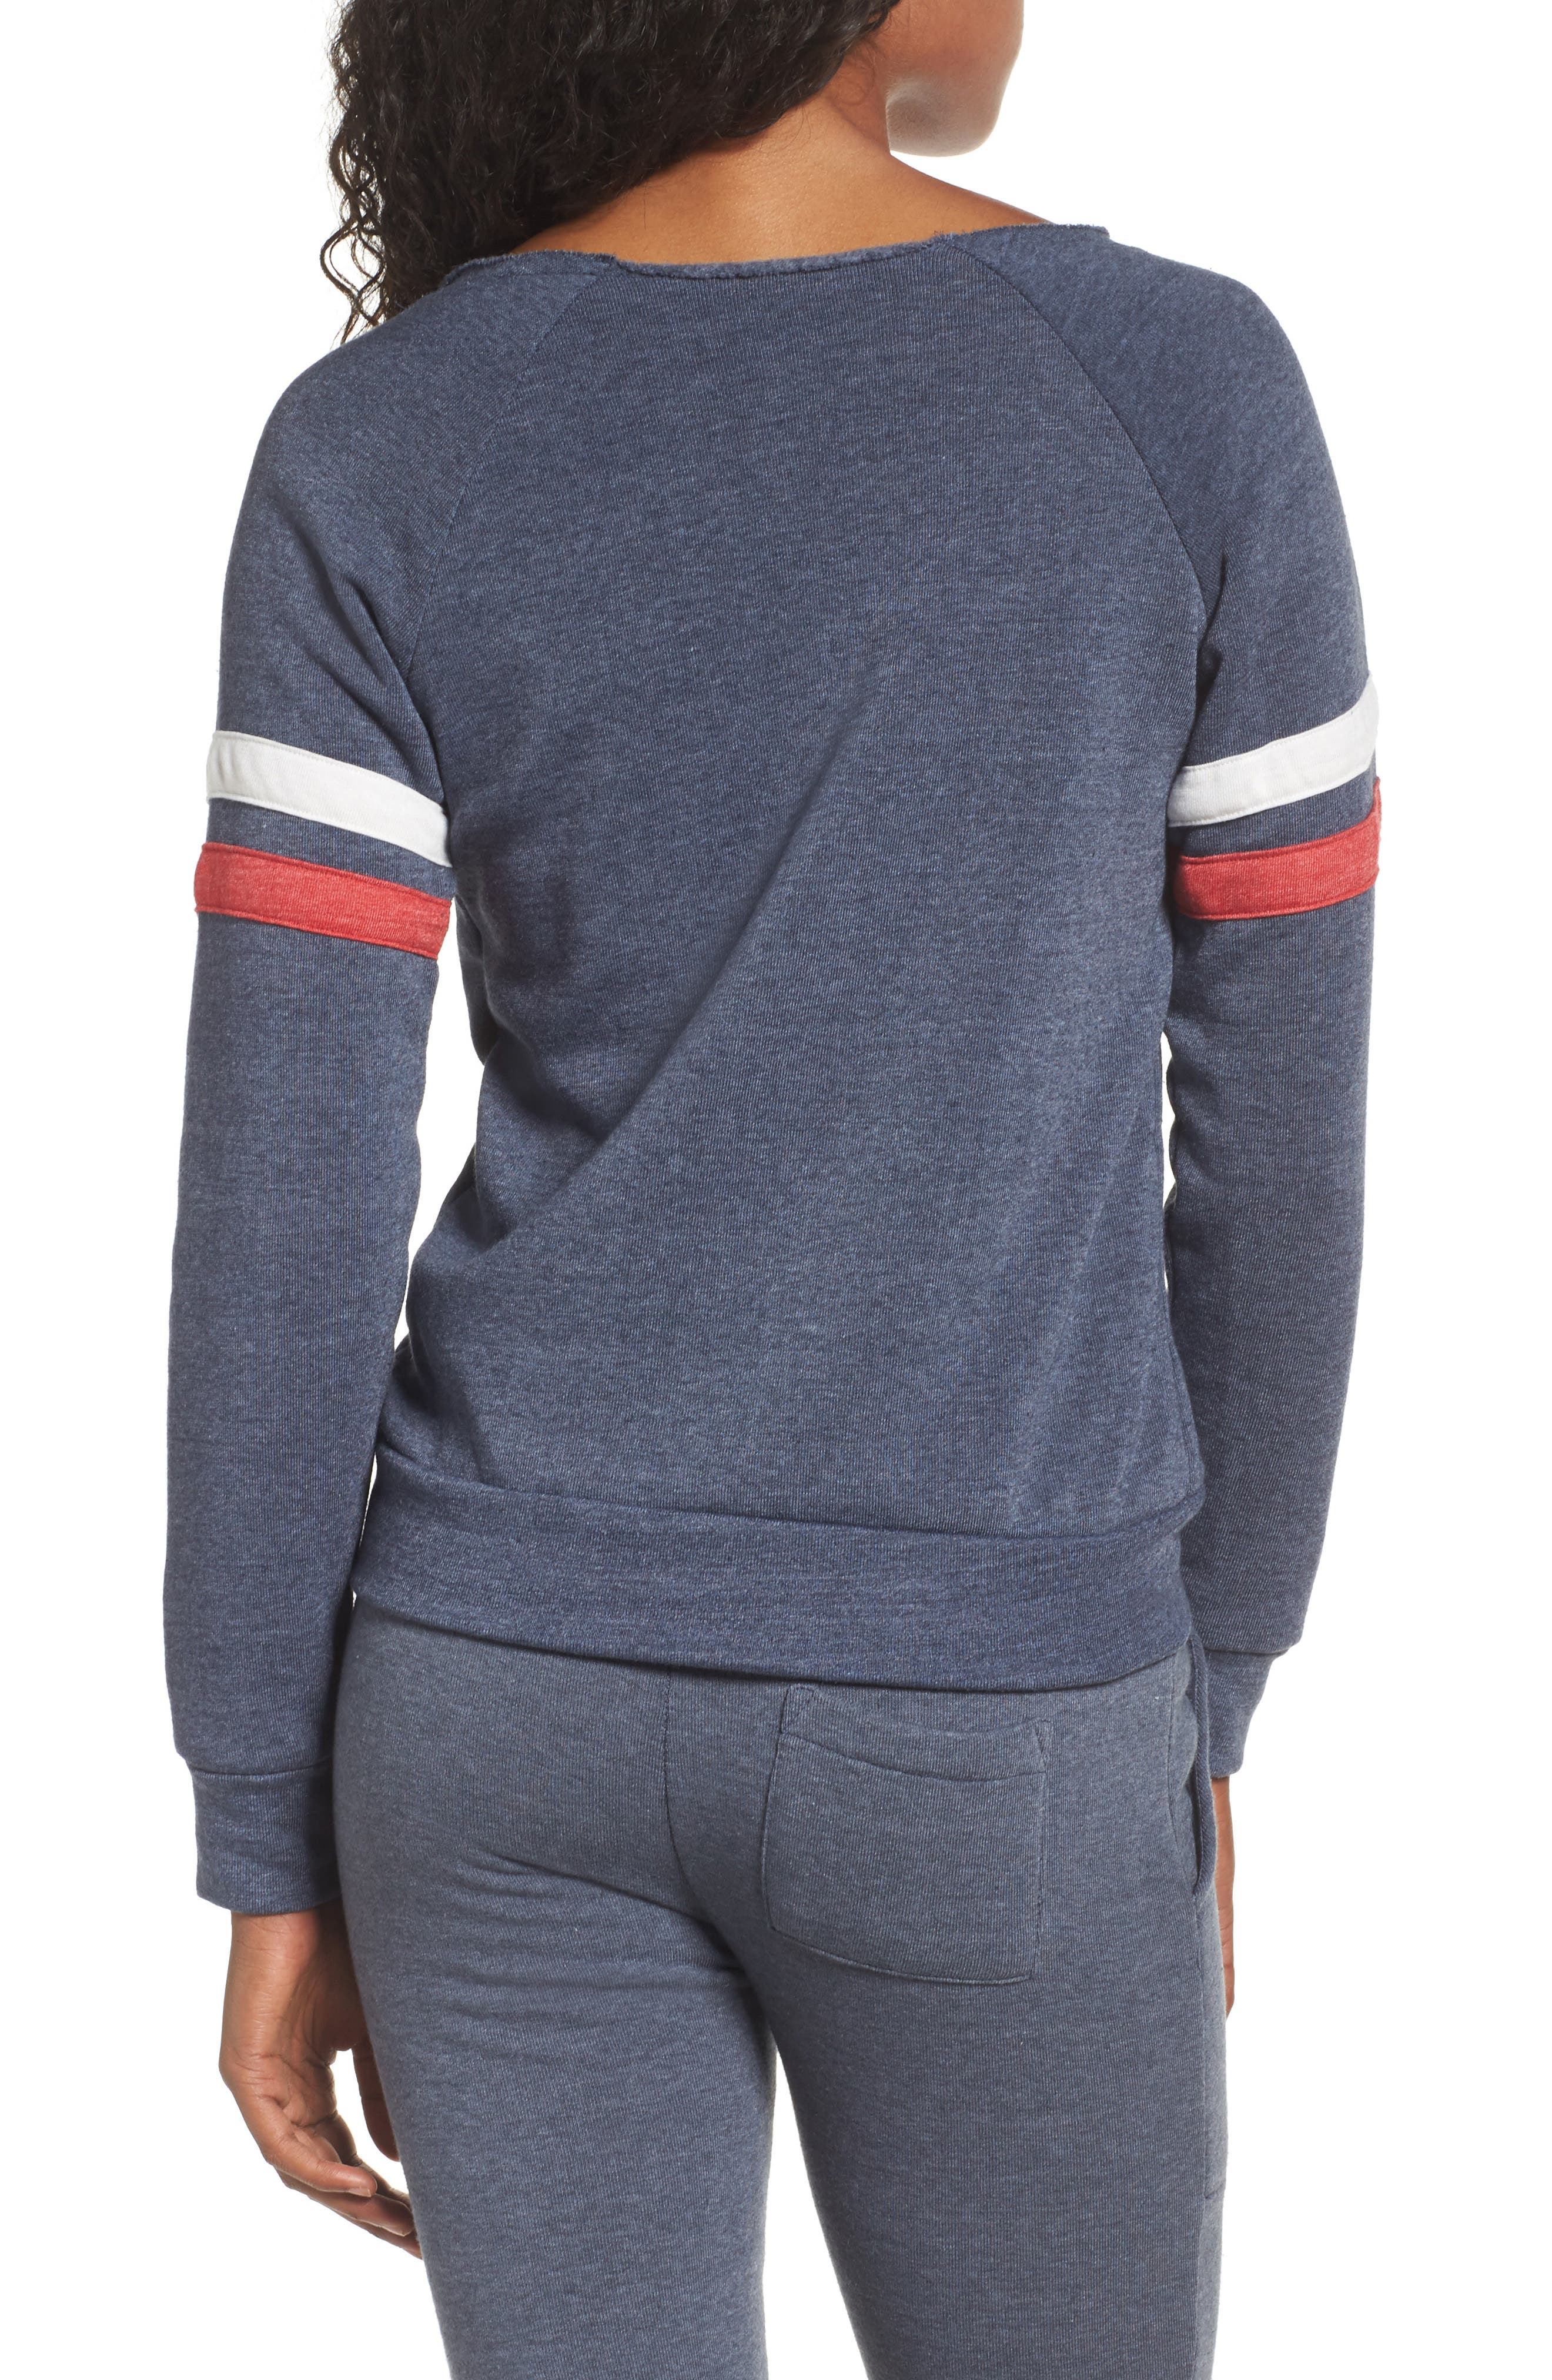 Maniac Sport Pullover,                             Alternate thumbnail 2, color,                             ECO TRUE NAVY